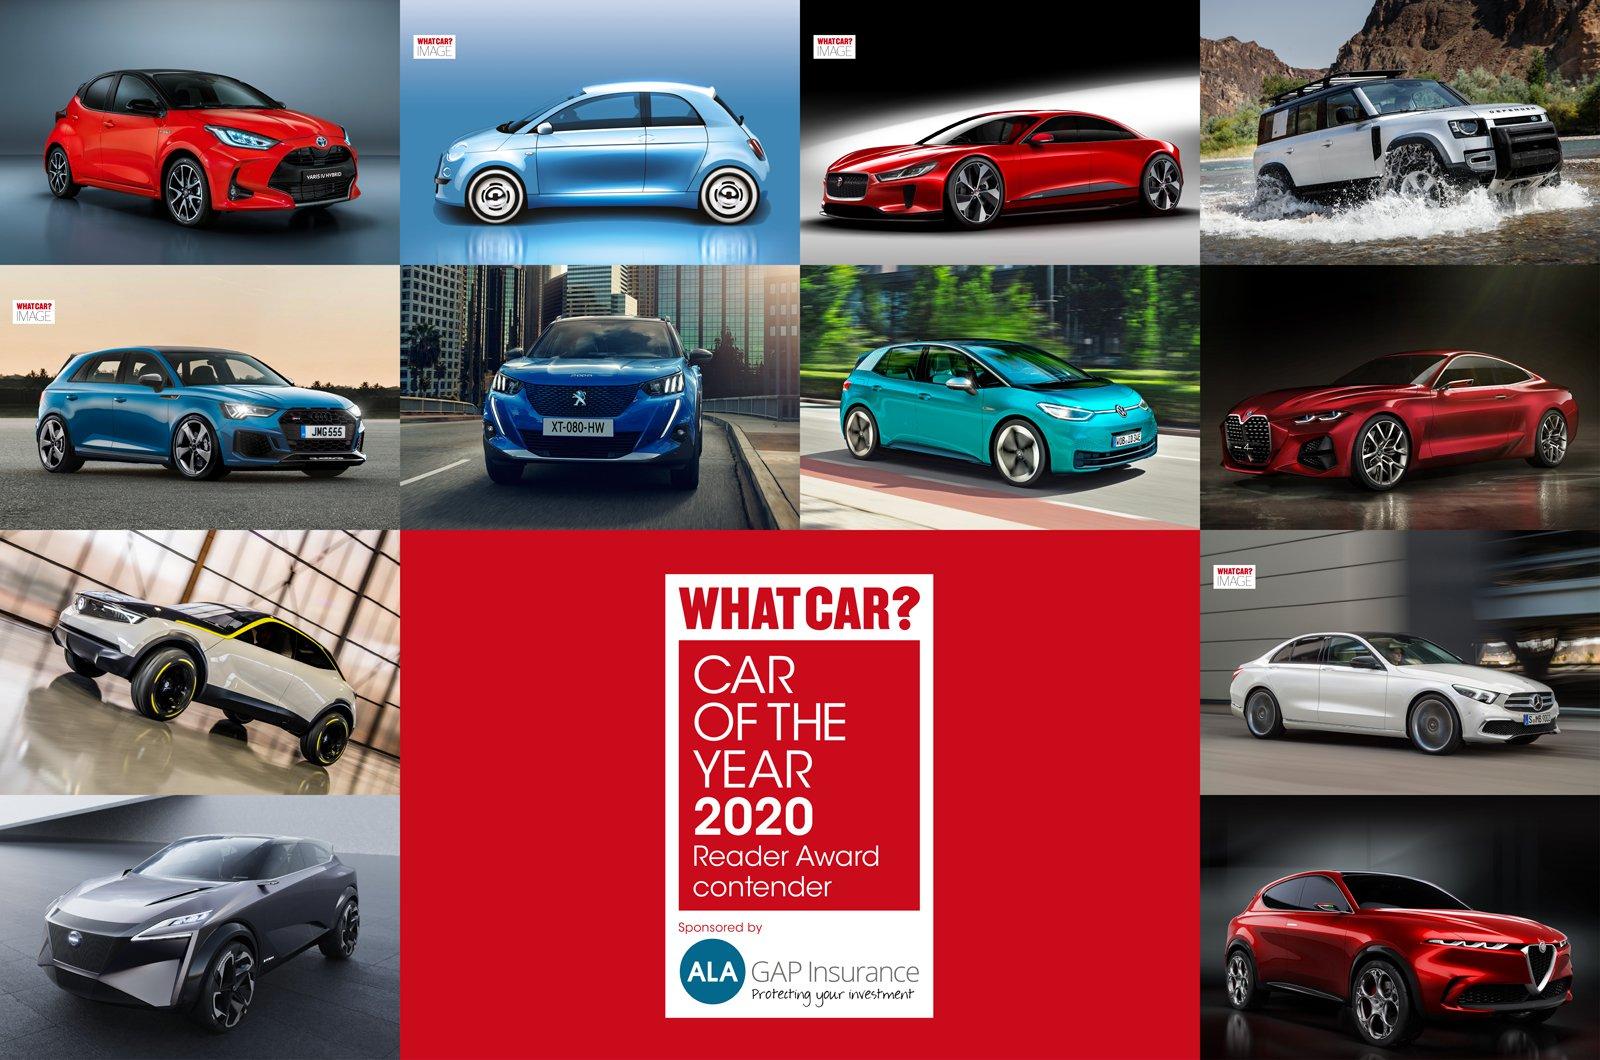 2020 What Car? Reader Award contenders